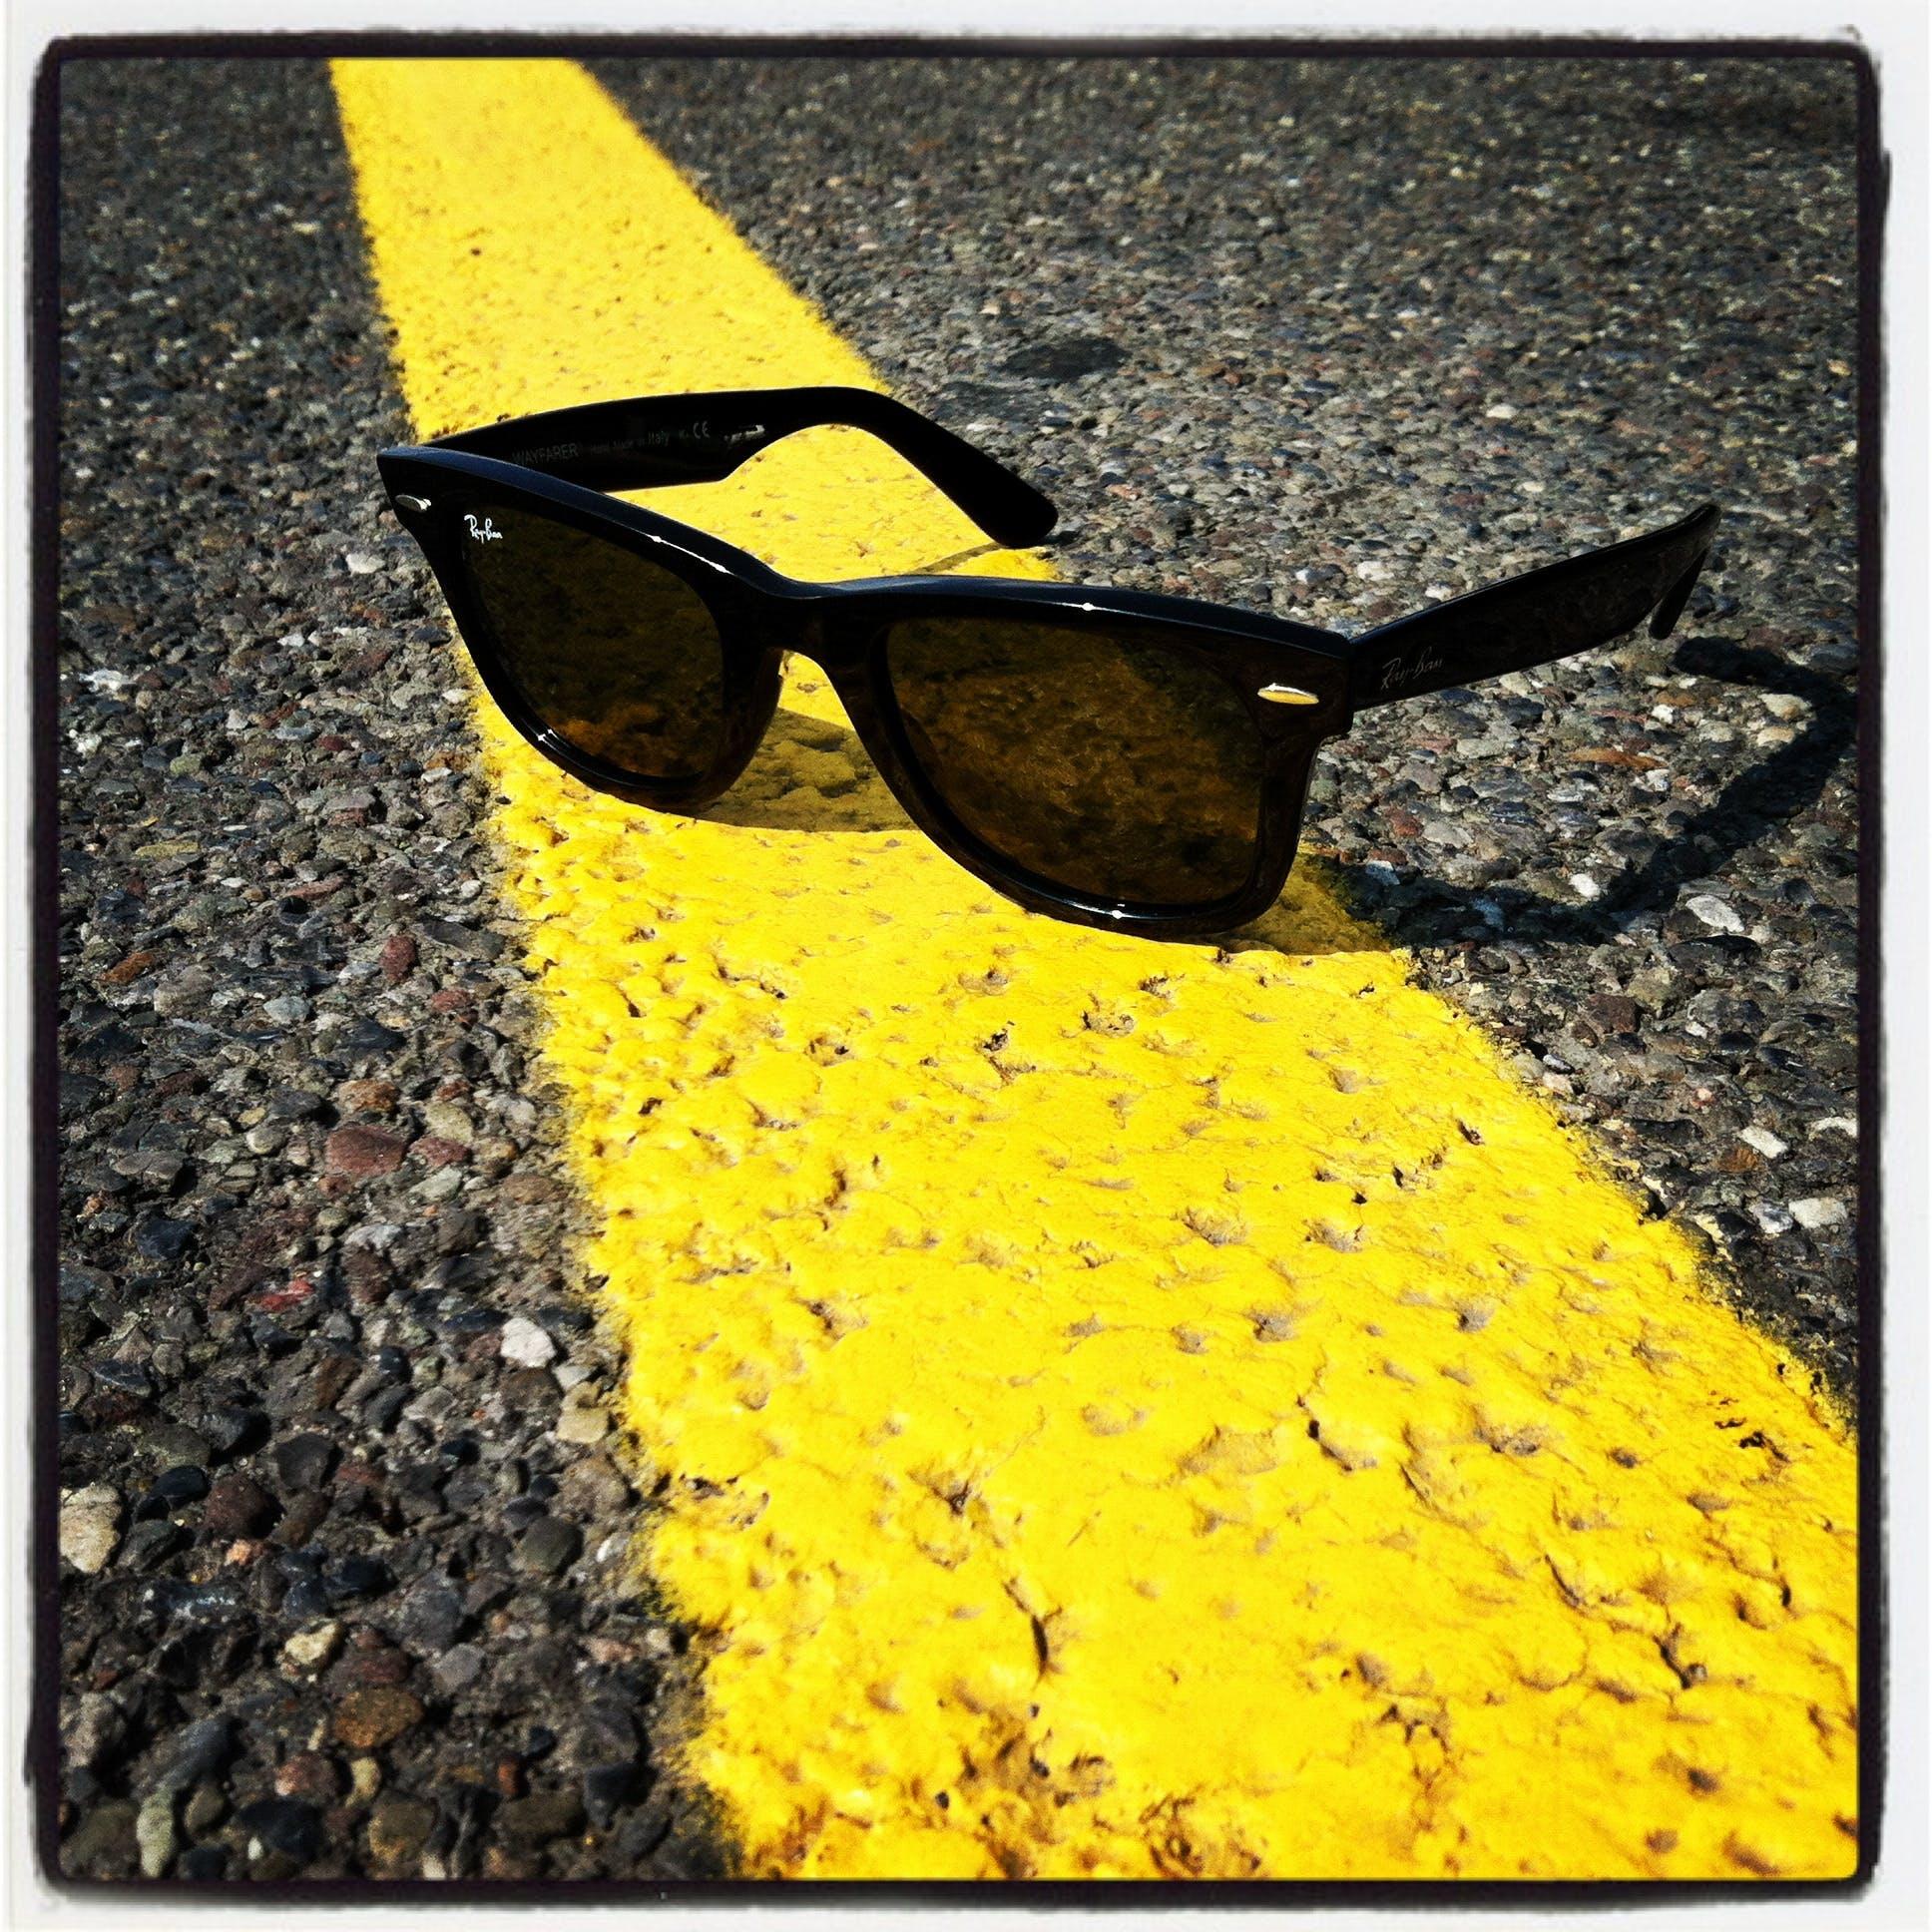 Black Ray-ban Wayfarer Sunglasses over Yellow Line on Street